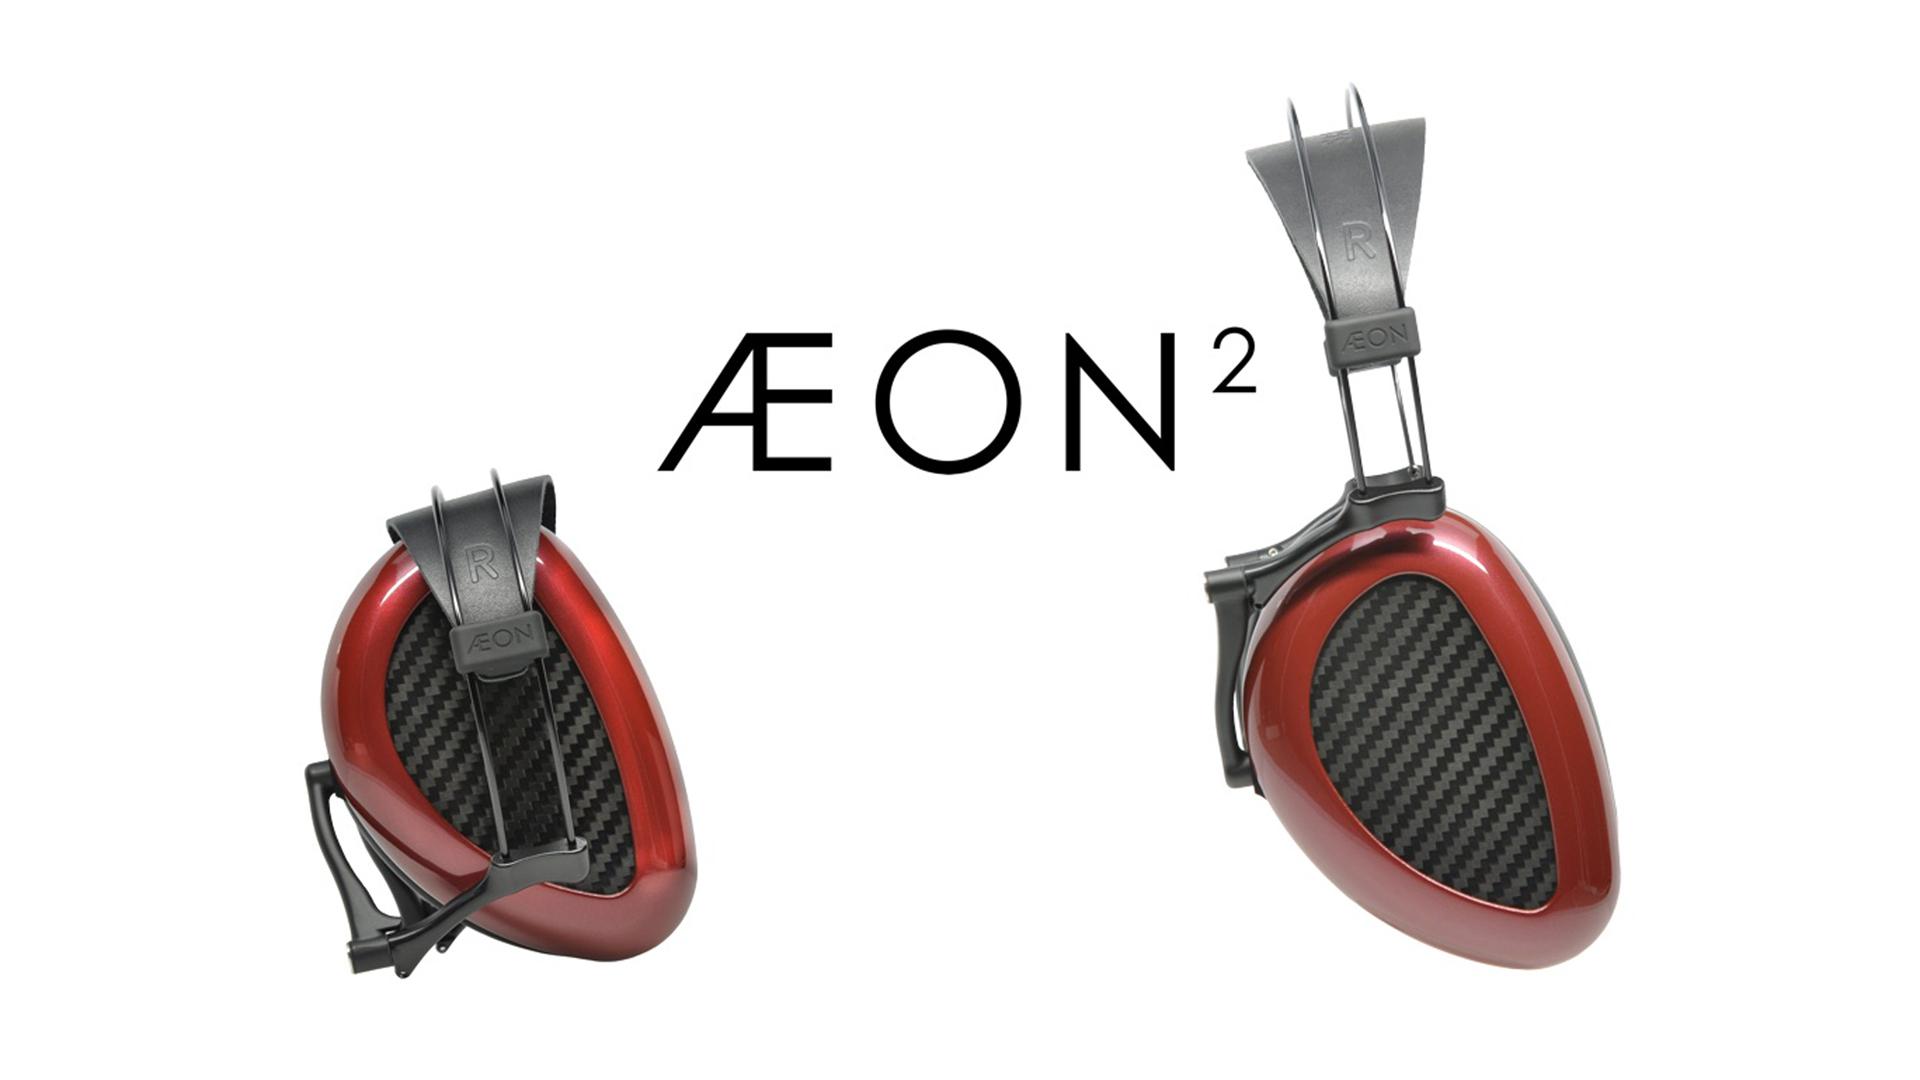 DC_AEON2_qu